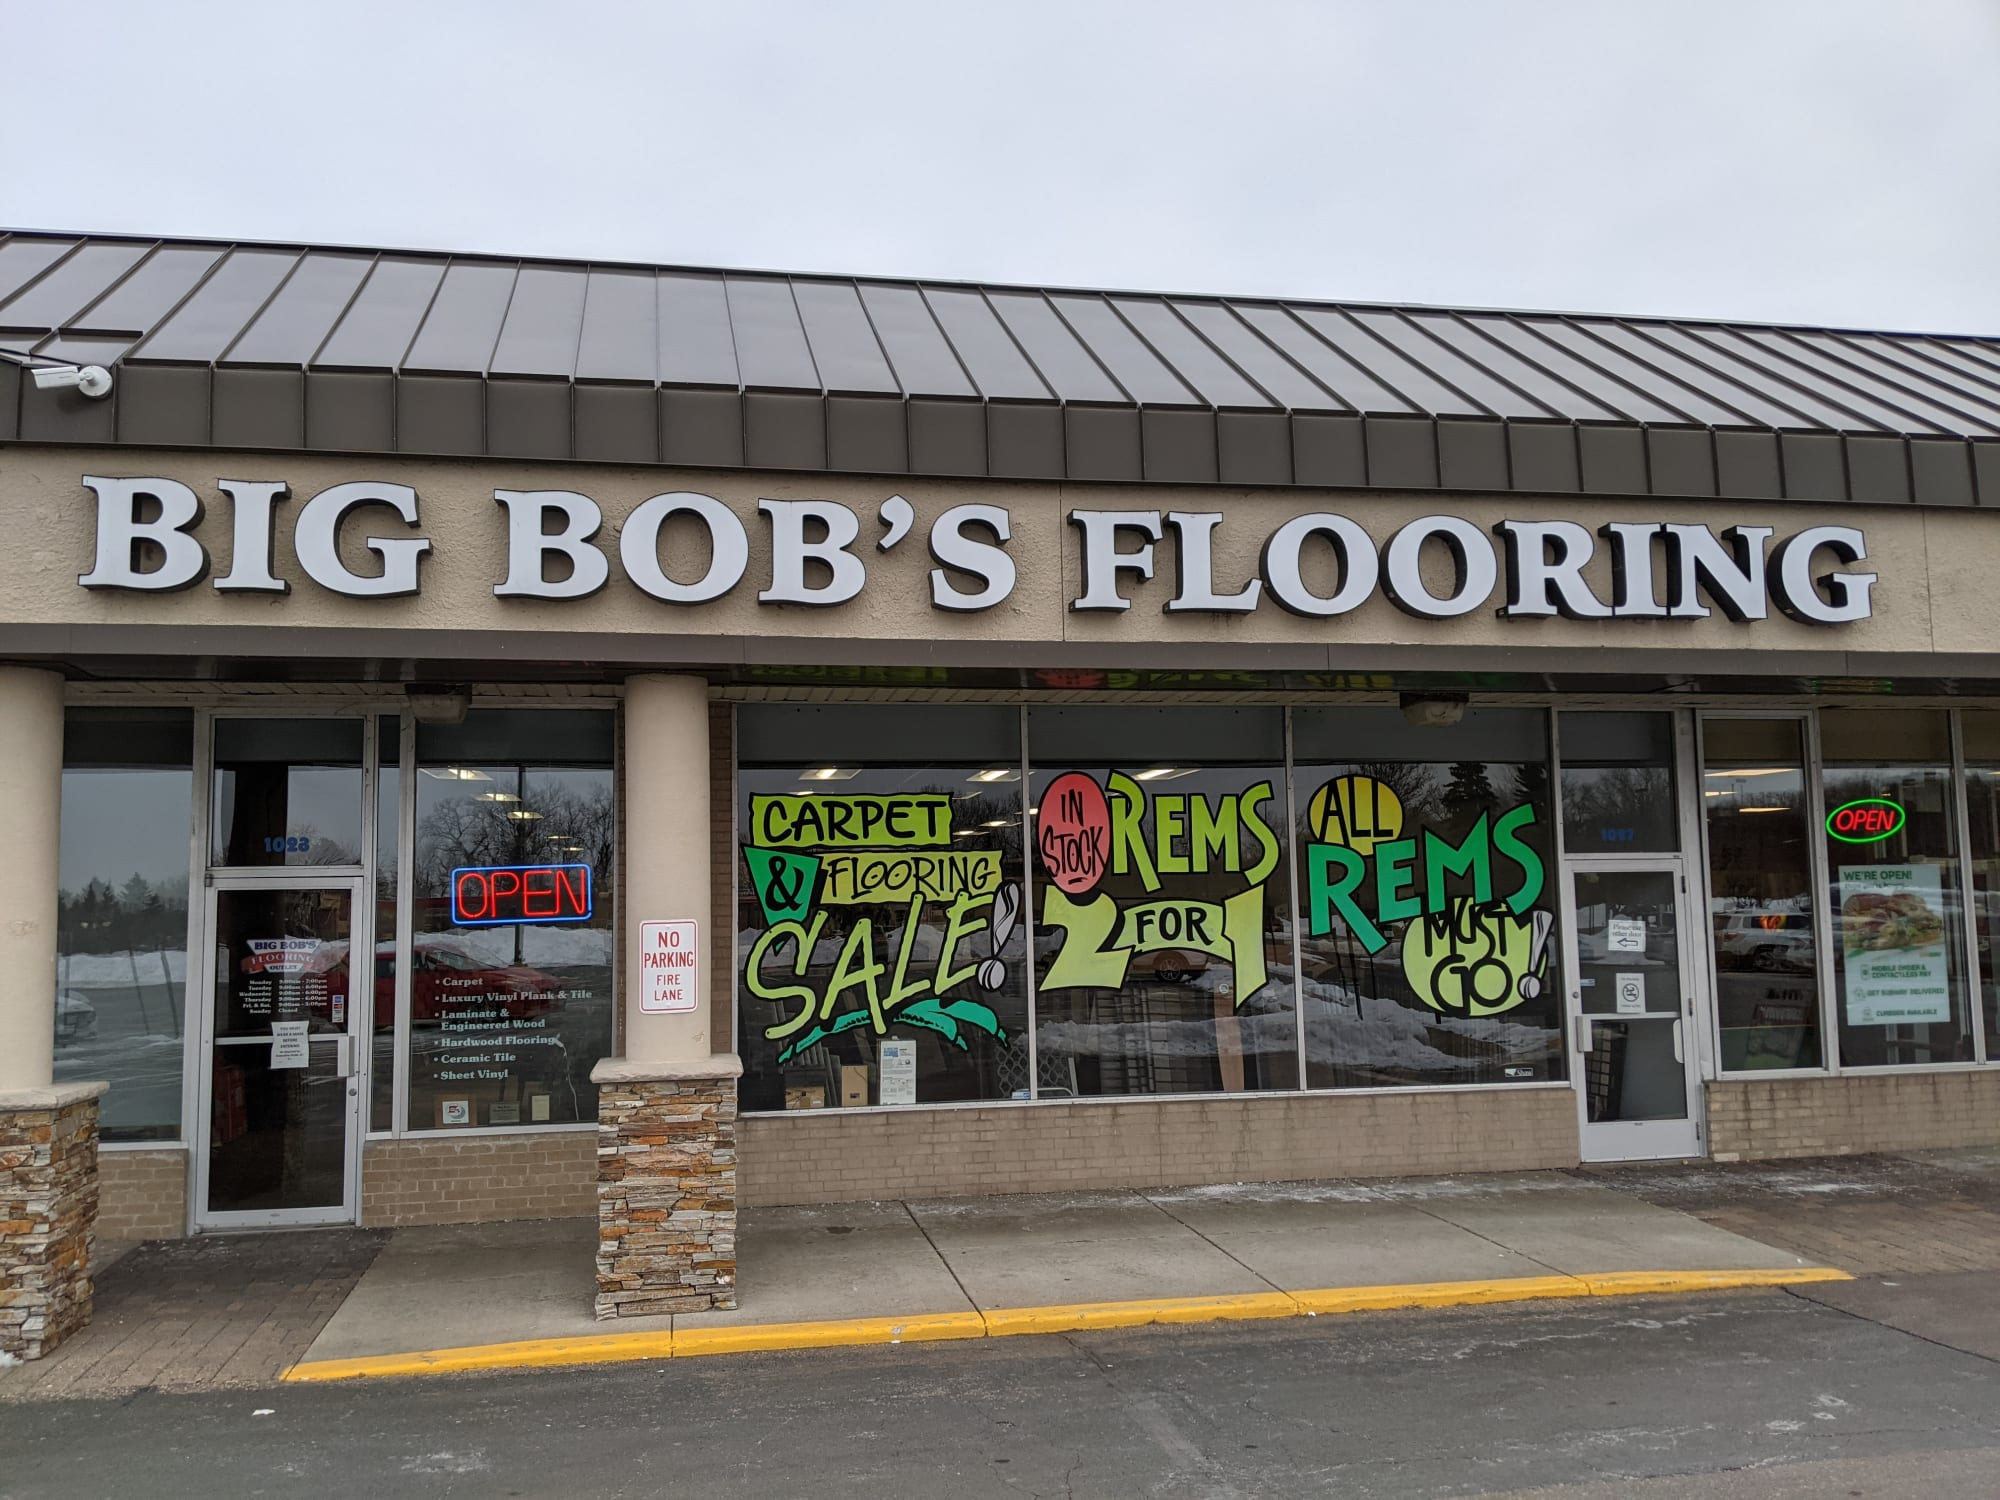 Big Bob's Flooring - 1023 E Moore Lake Dr Fridley, MN 55432